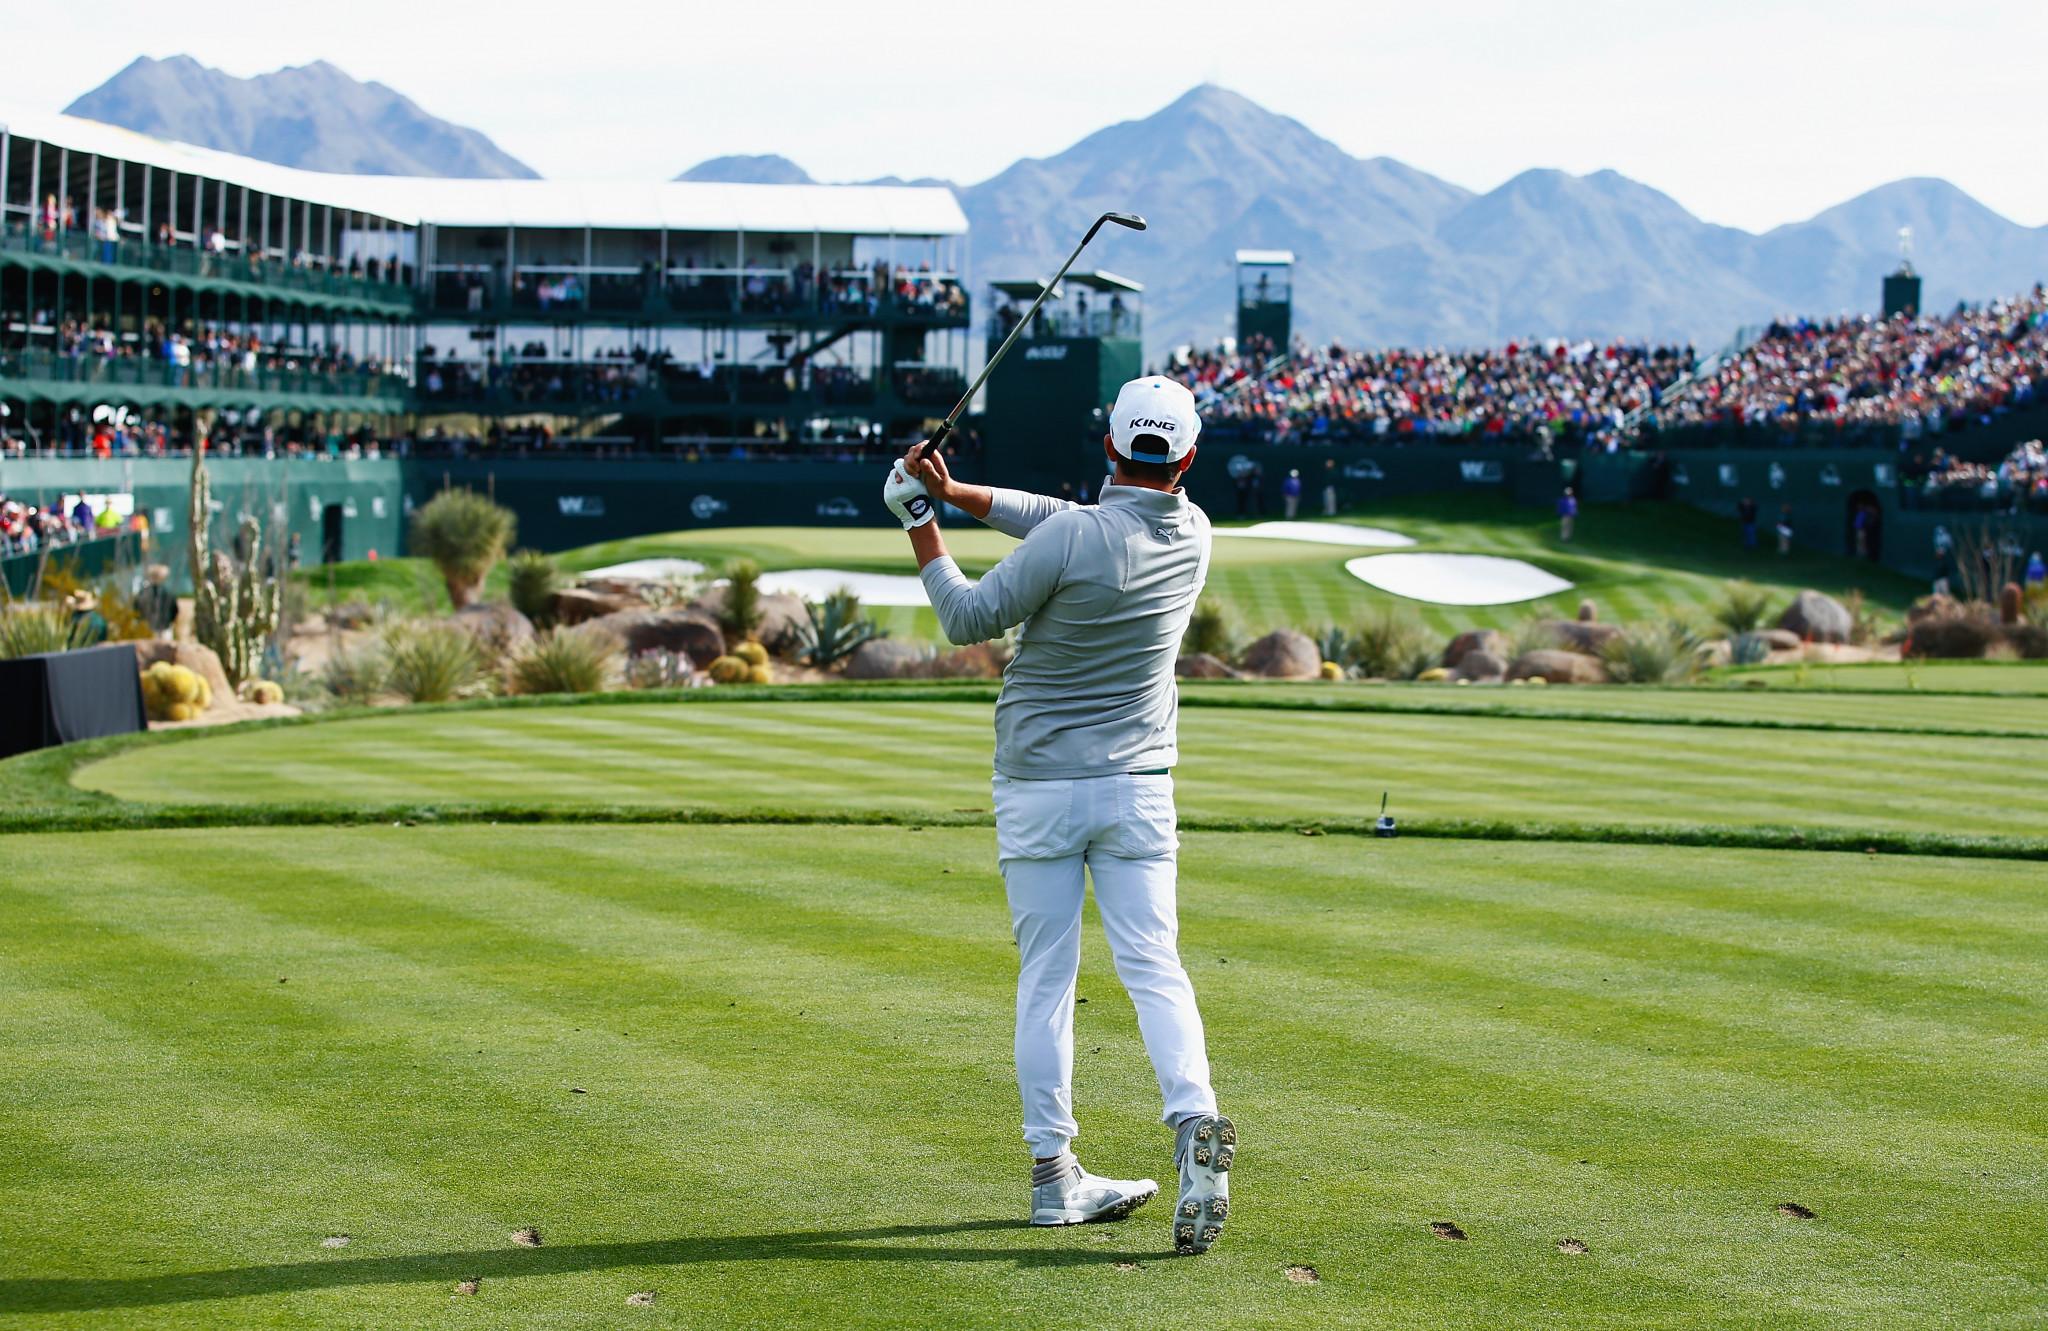 PGA Tour aiming for June 8 return without spectators